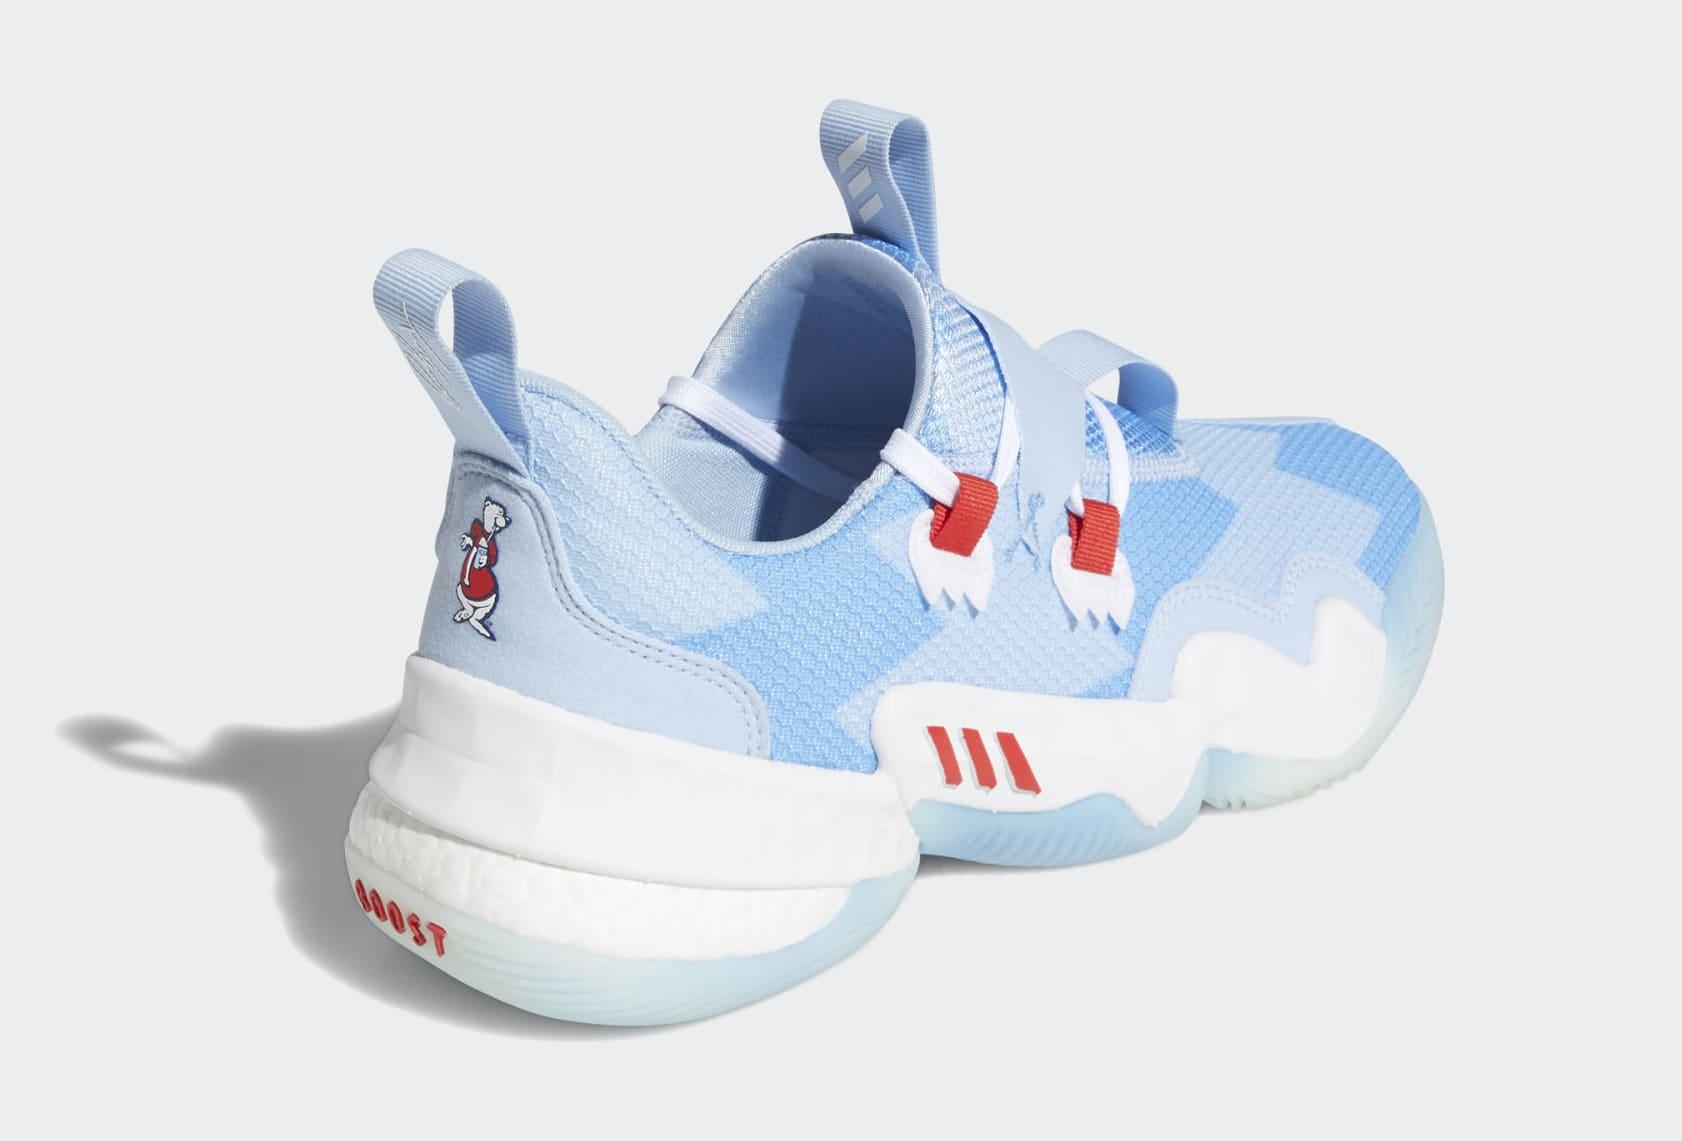 Adidas Trae Young 1 H68997 Heel